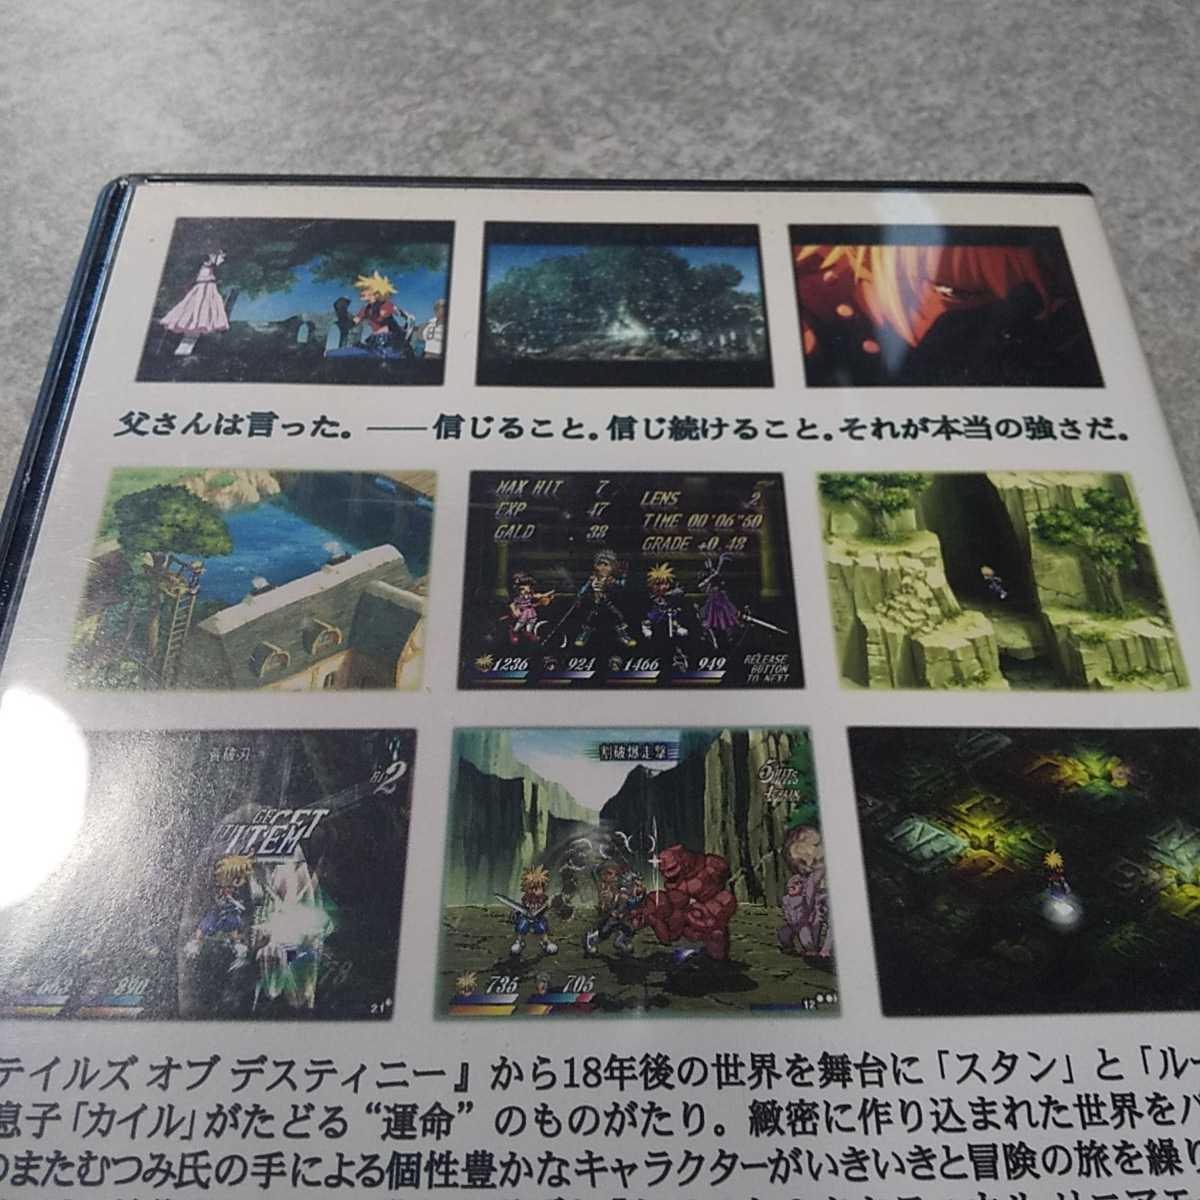 PS2【テイルズオブデスティニー2】ナムコ [送料無料]返金保証あり